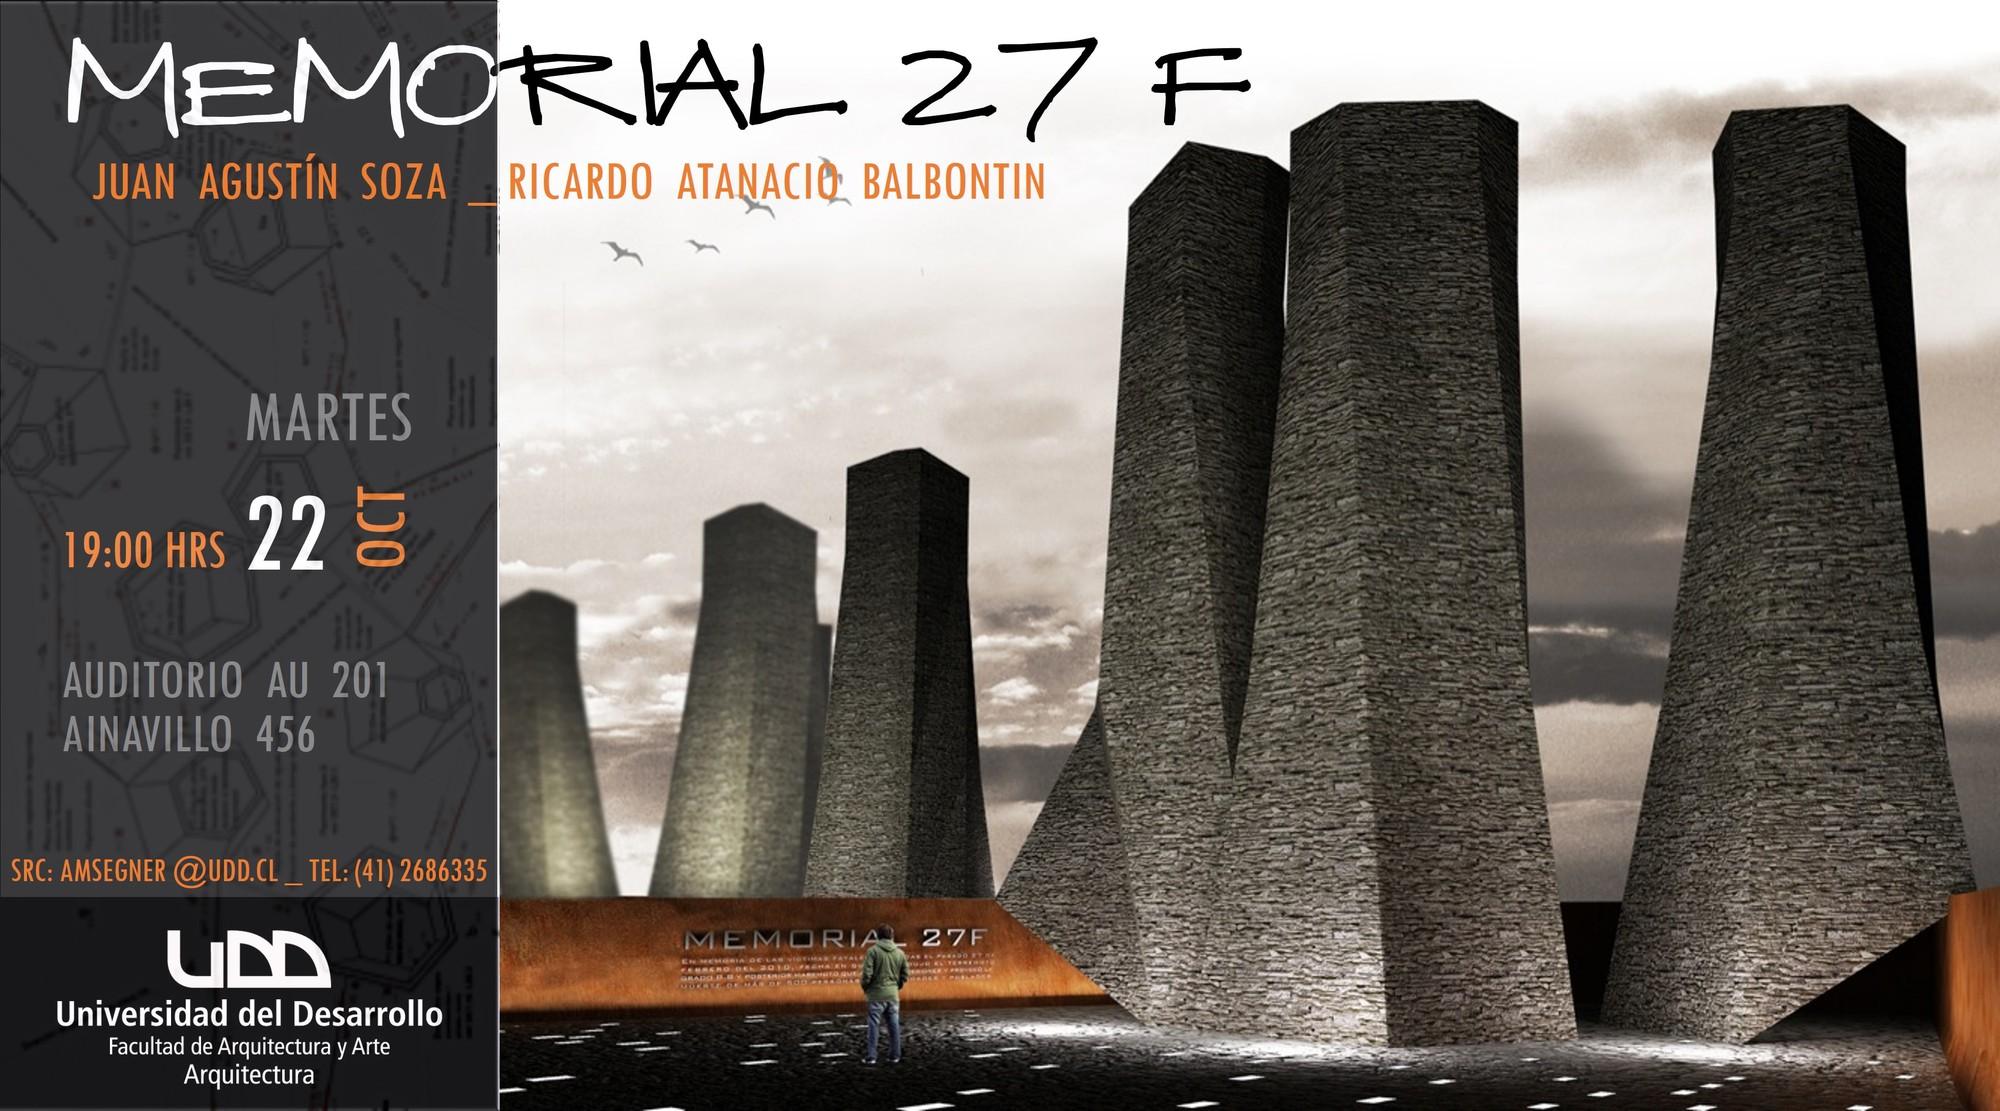 Memorial 27F, arquitectos Ricardo Atanacio Balbontin y Juan Agustín Soza en charla UDD, Courtesy of UDD